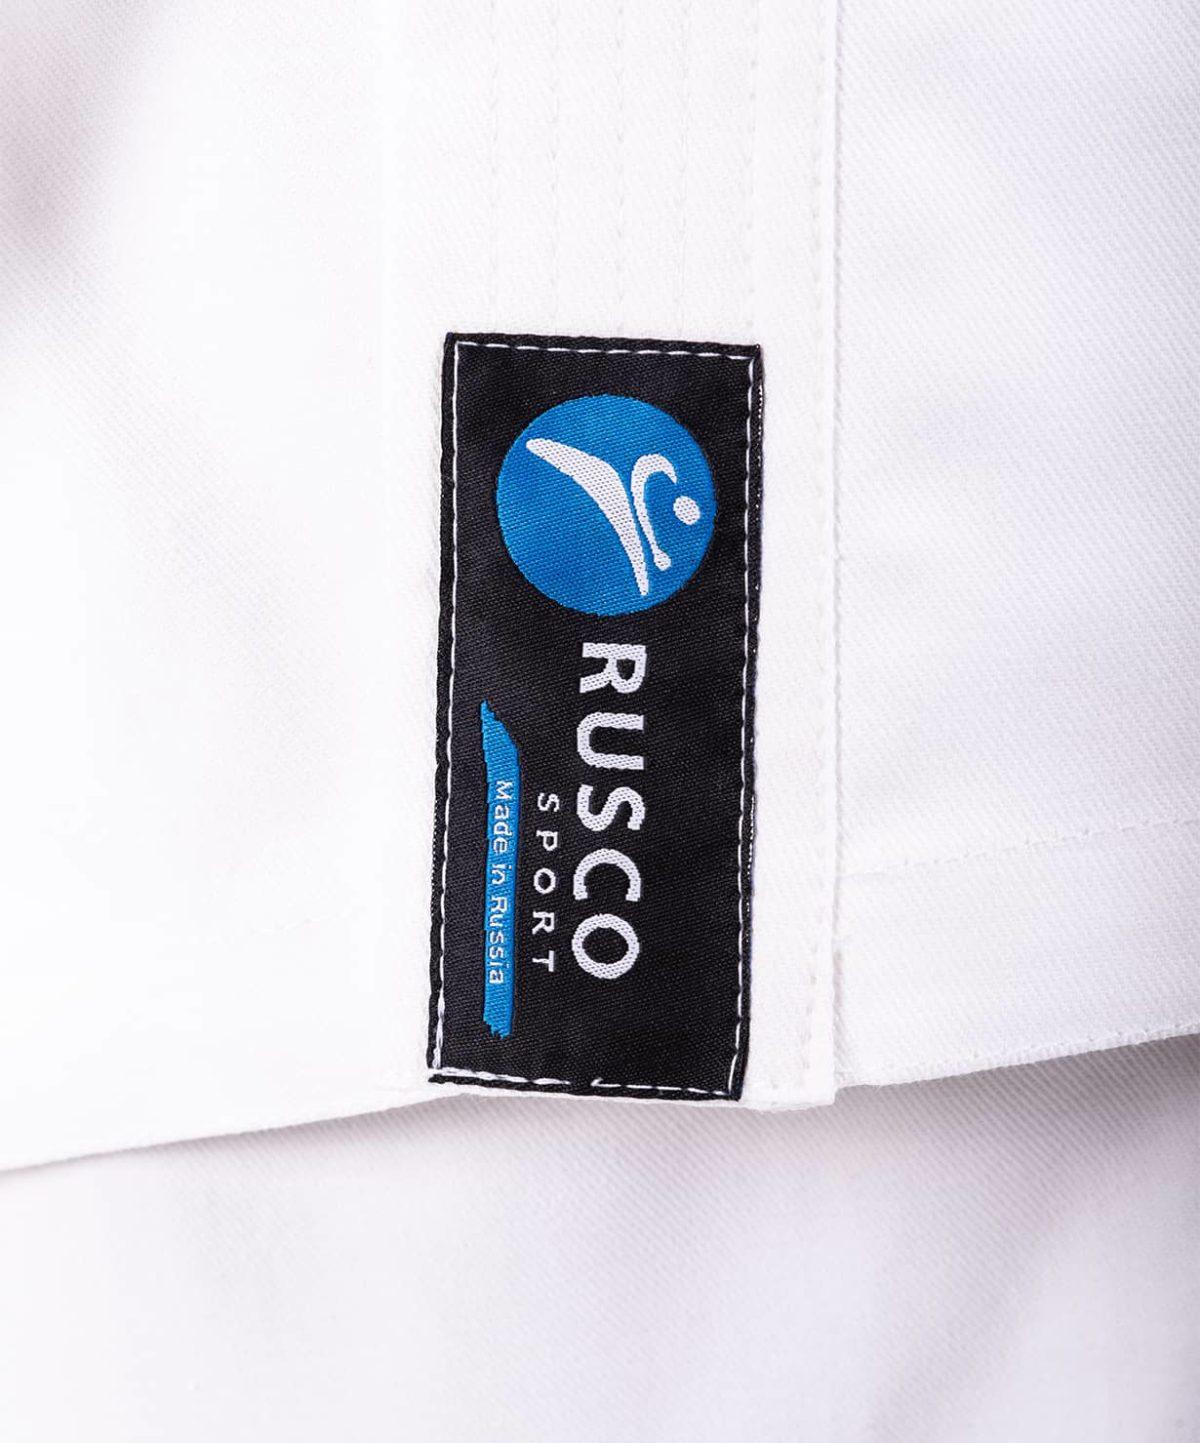 RUSCO Кимоно для рукопашного боя 4/170 Classic 17241 - 3